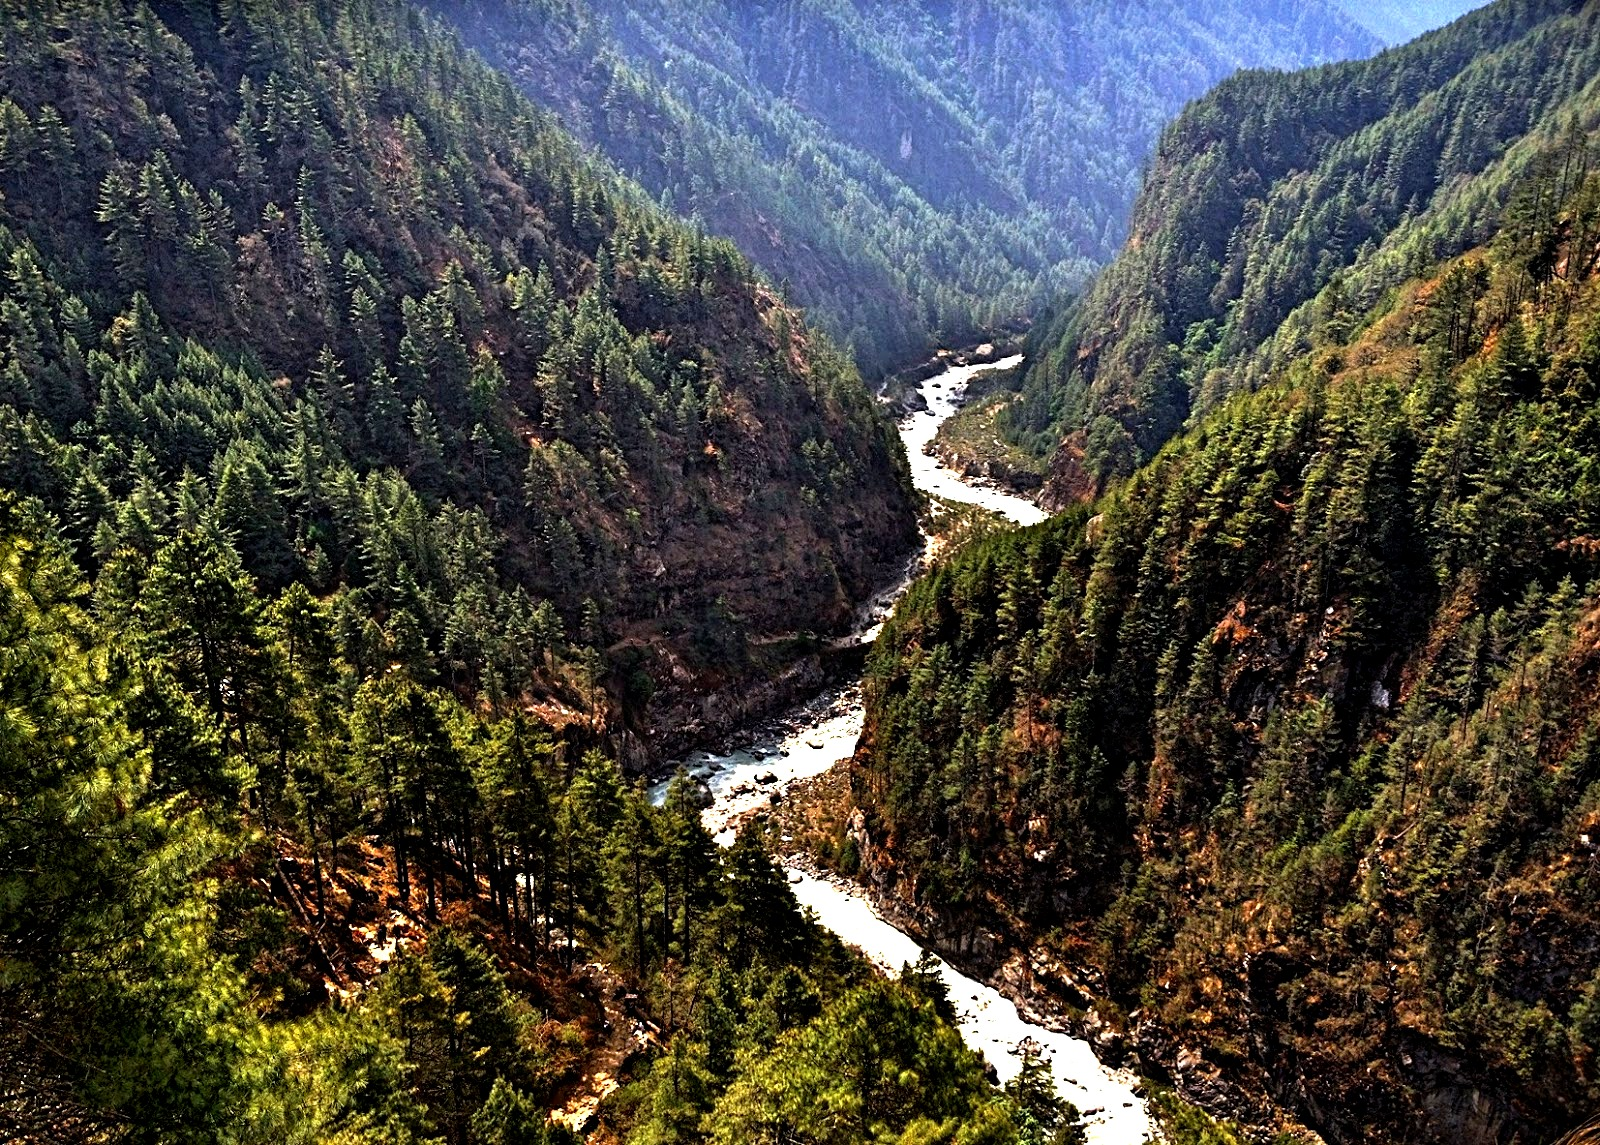 леса парка сагарматха